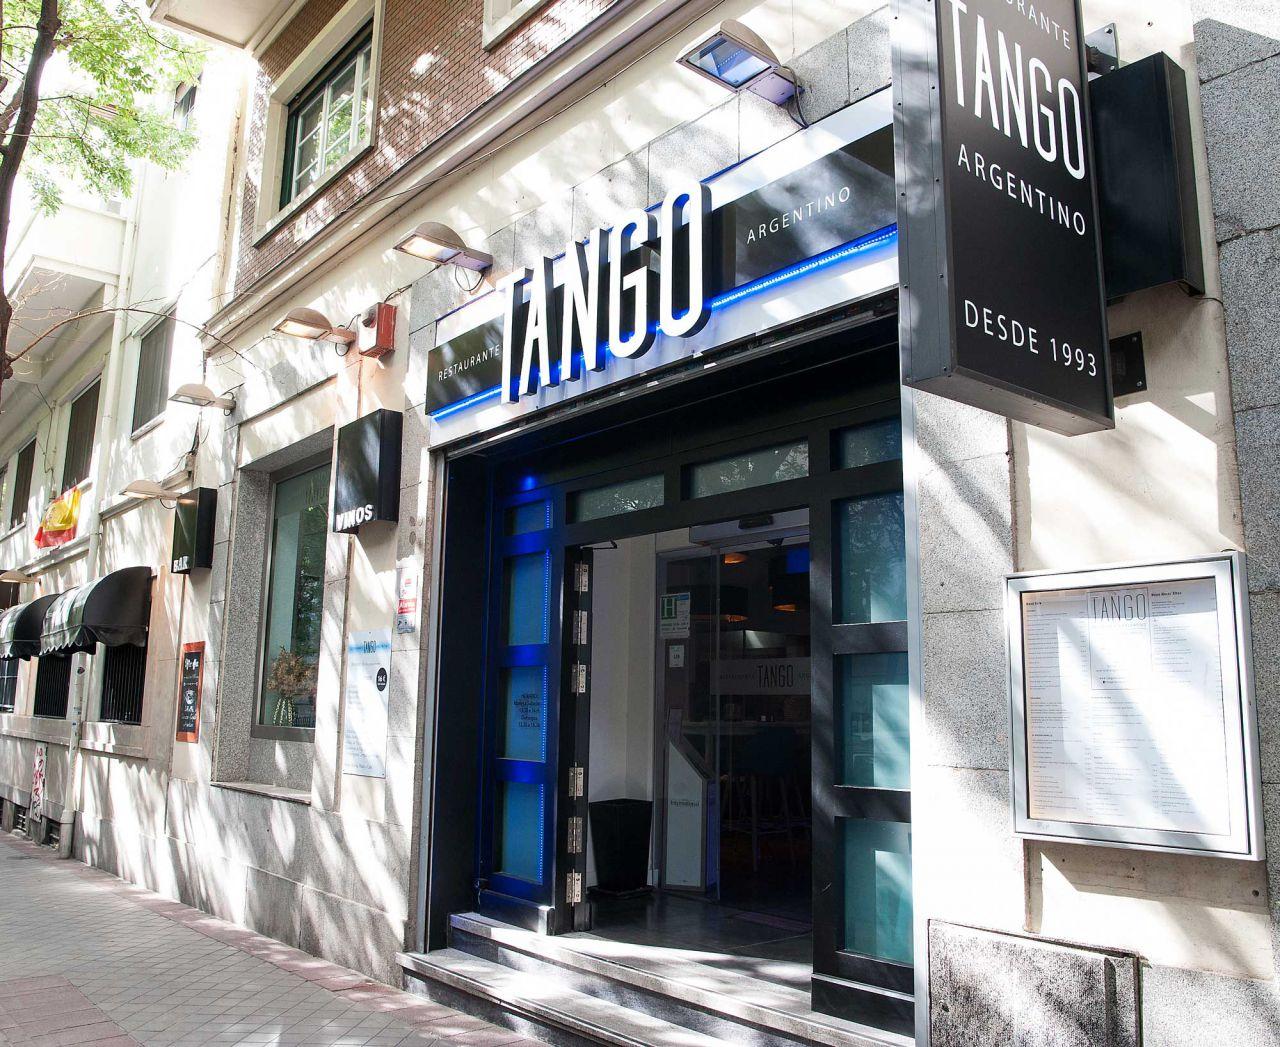 Nº 95. tango (restaurante argentino)   Tlf. 917 95 78 00  www.tangorestaurantemadrid.com